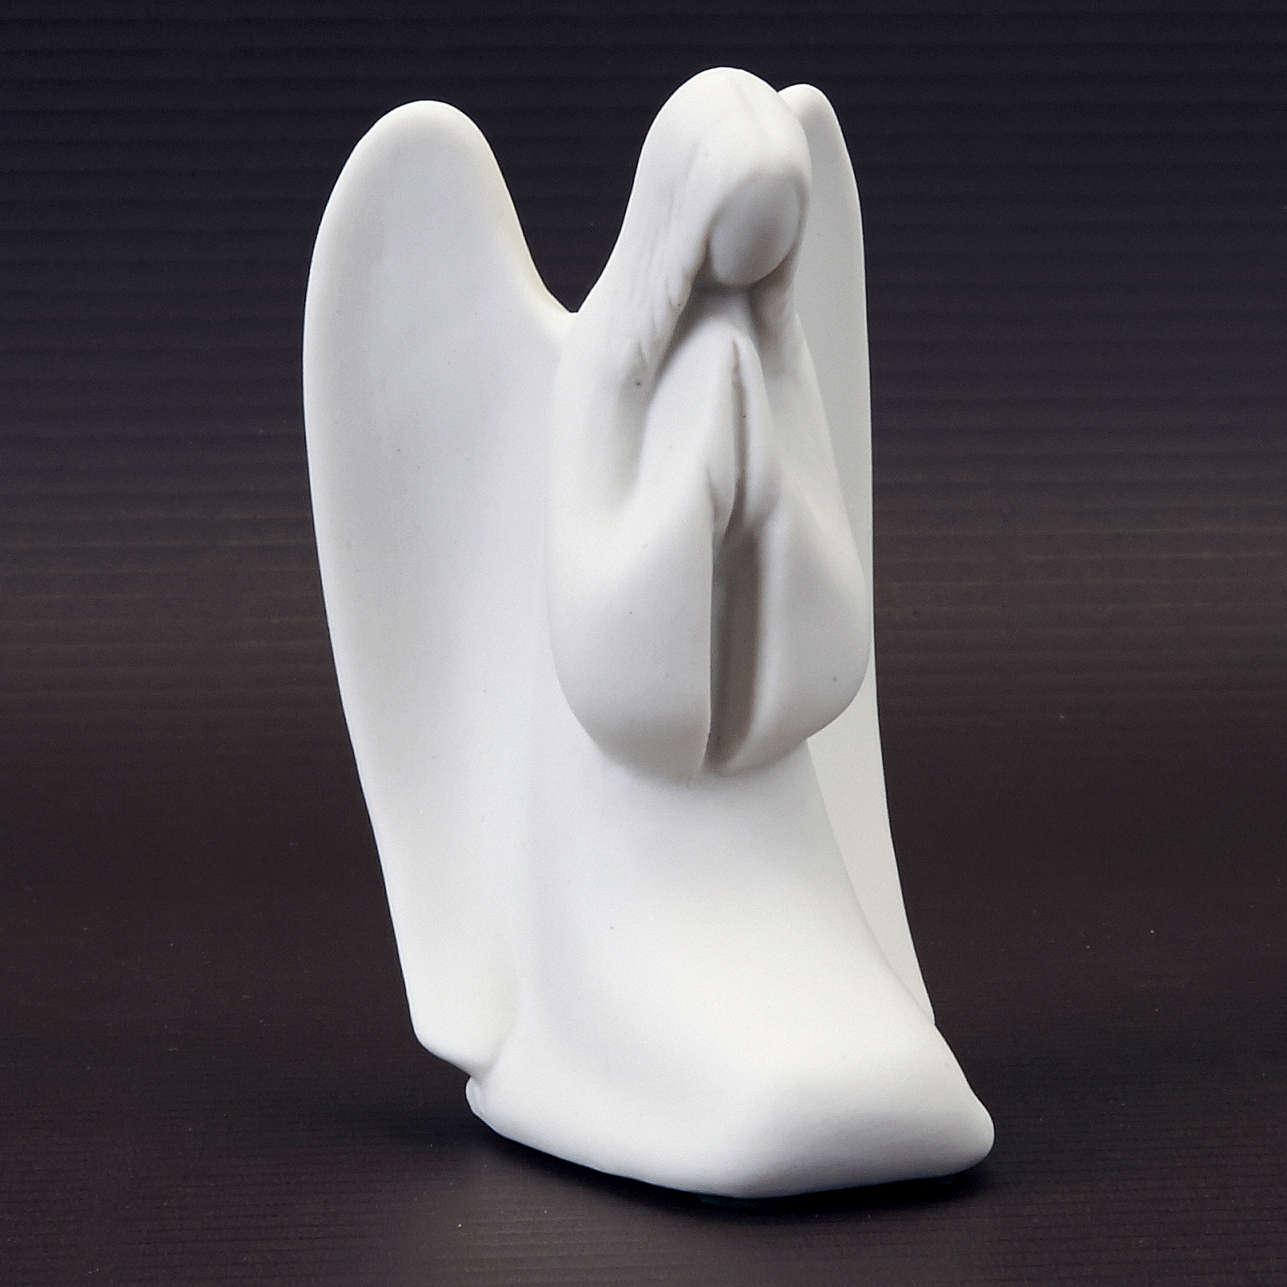 Anioł Stróż mini Francesco Pinton 9 cm 3